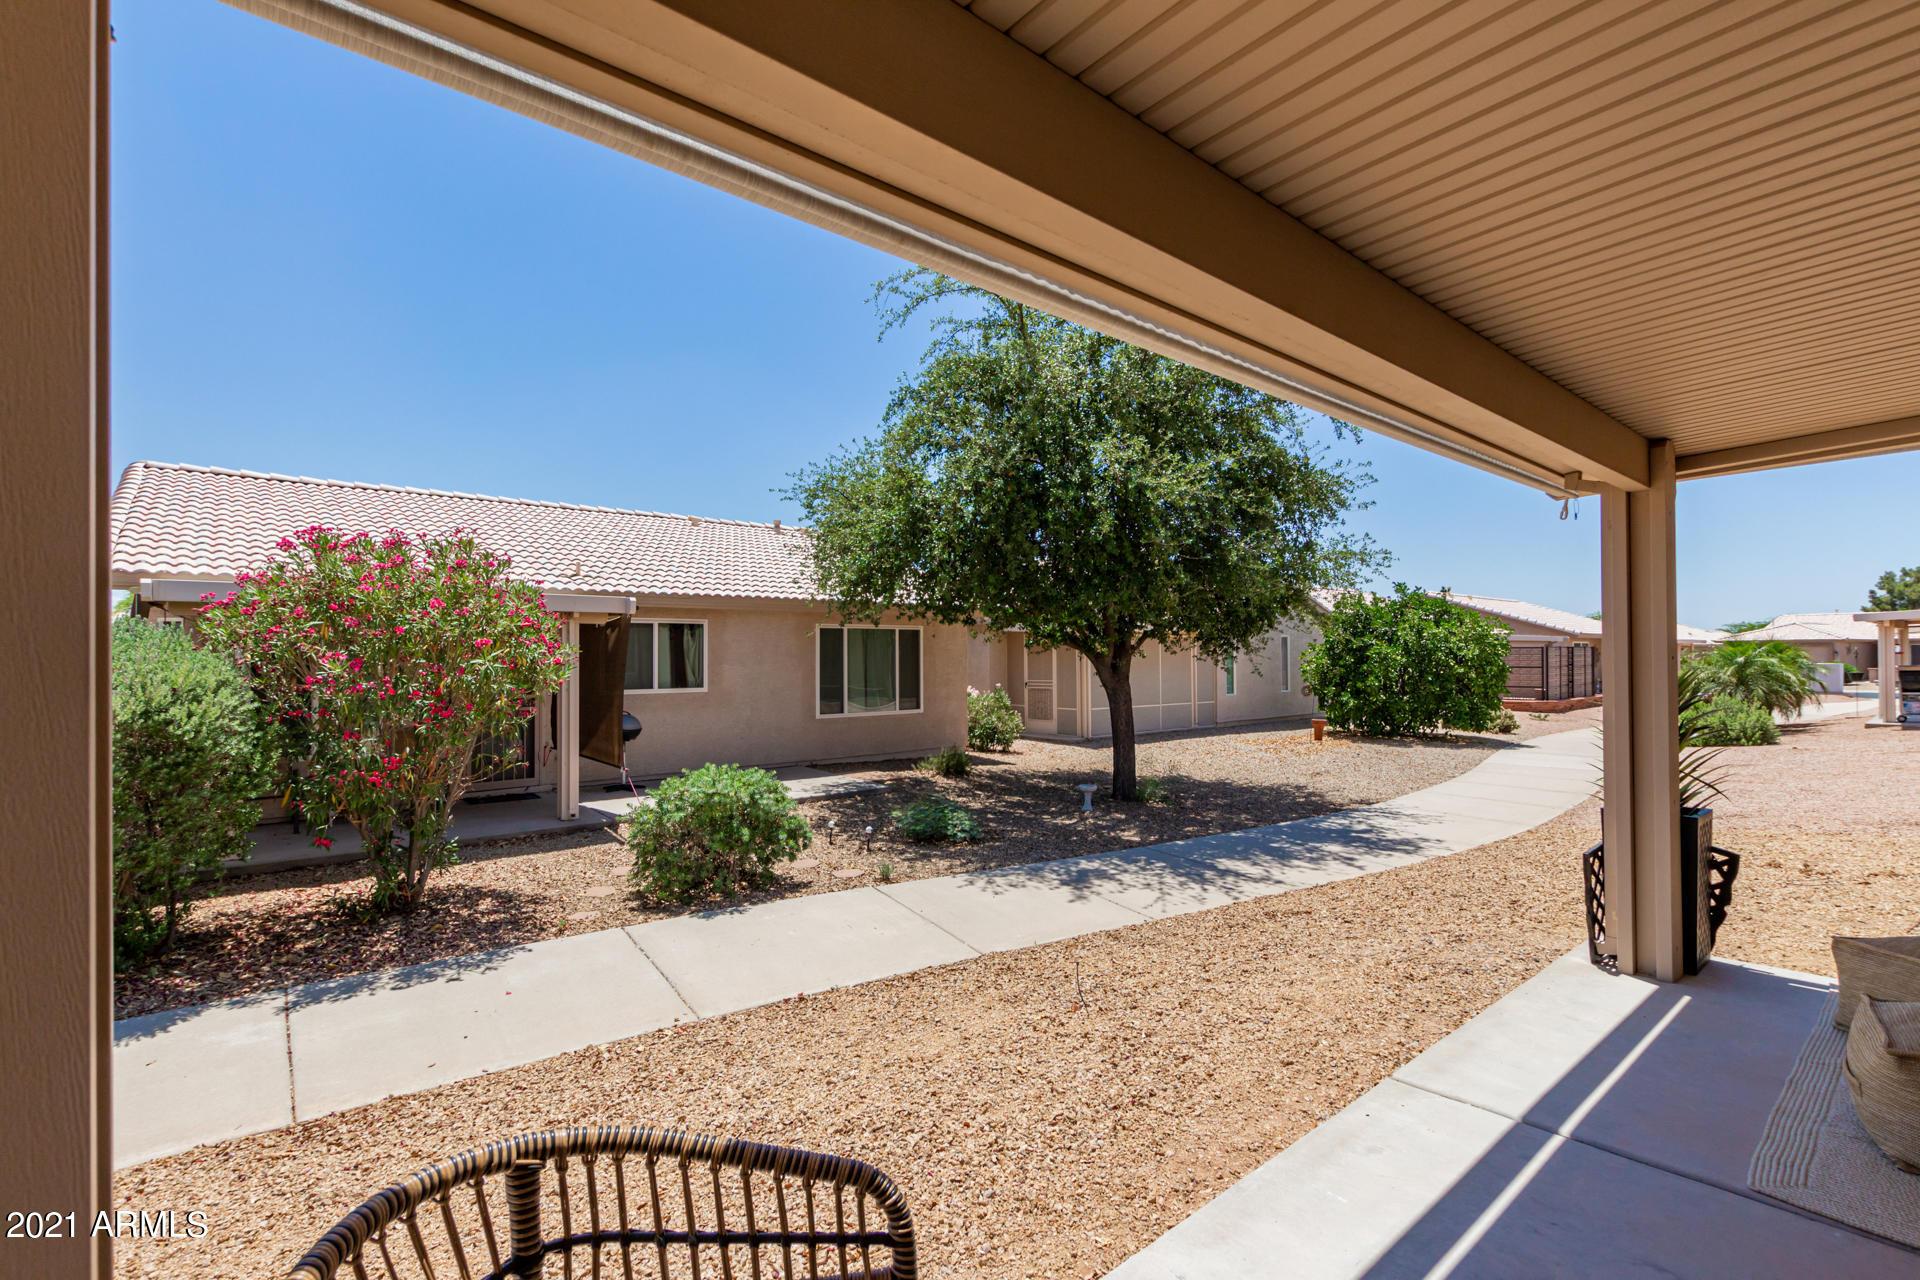 MLS 6294779 1391 E TORREY PINES Lane, Chandler, AZ 85249 Chandler AZ Adult Community